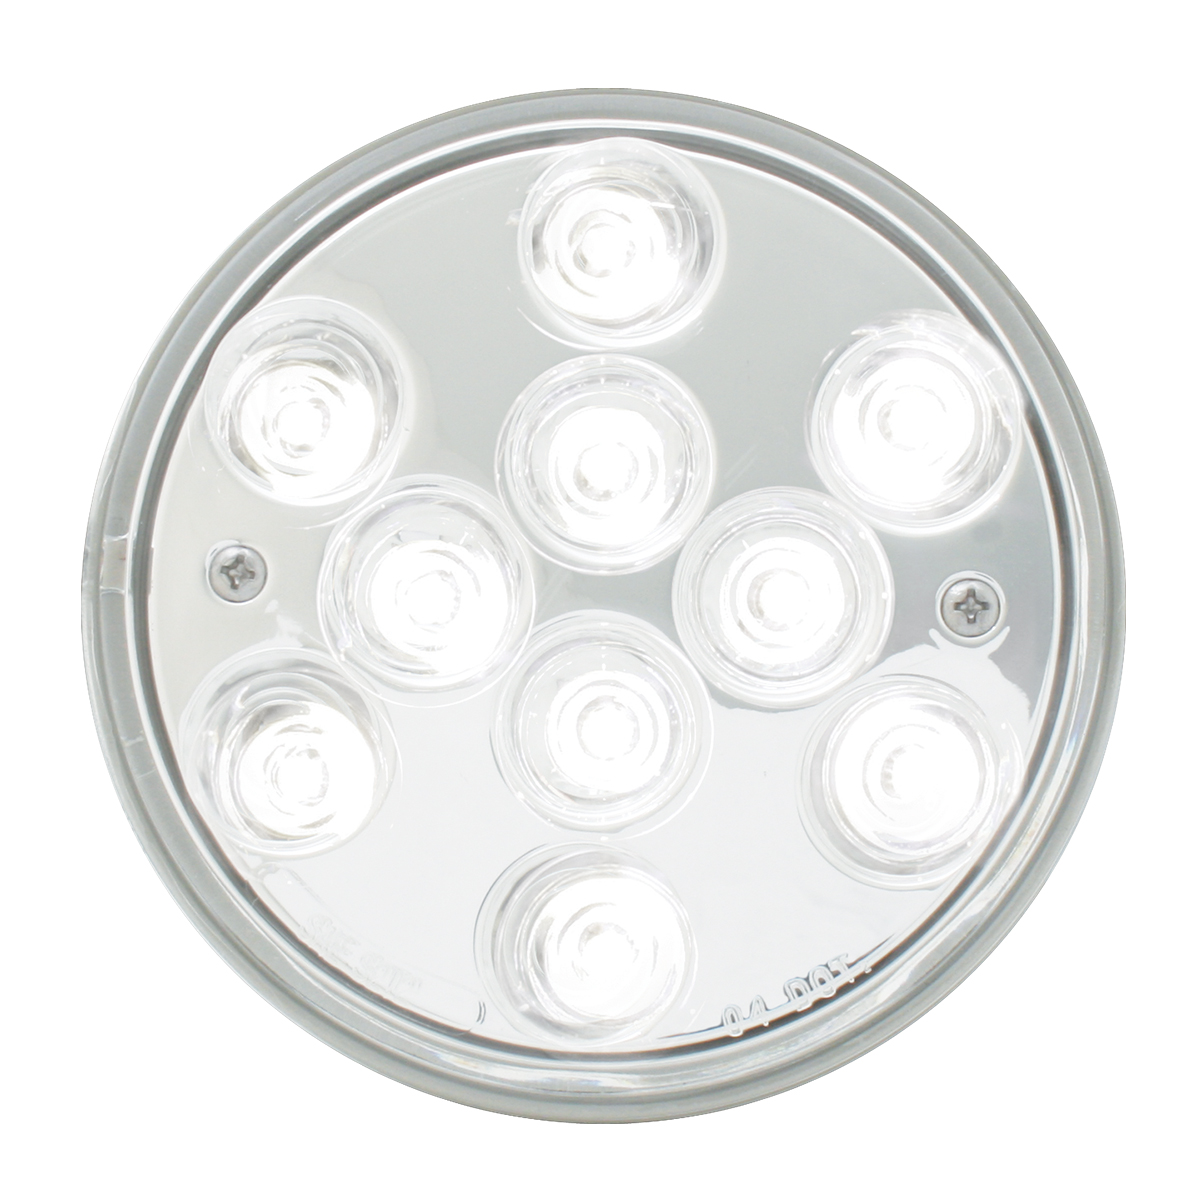 "77458 4"" Mega 10 Plus LED Light in White/Clear"